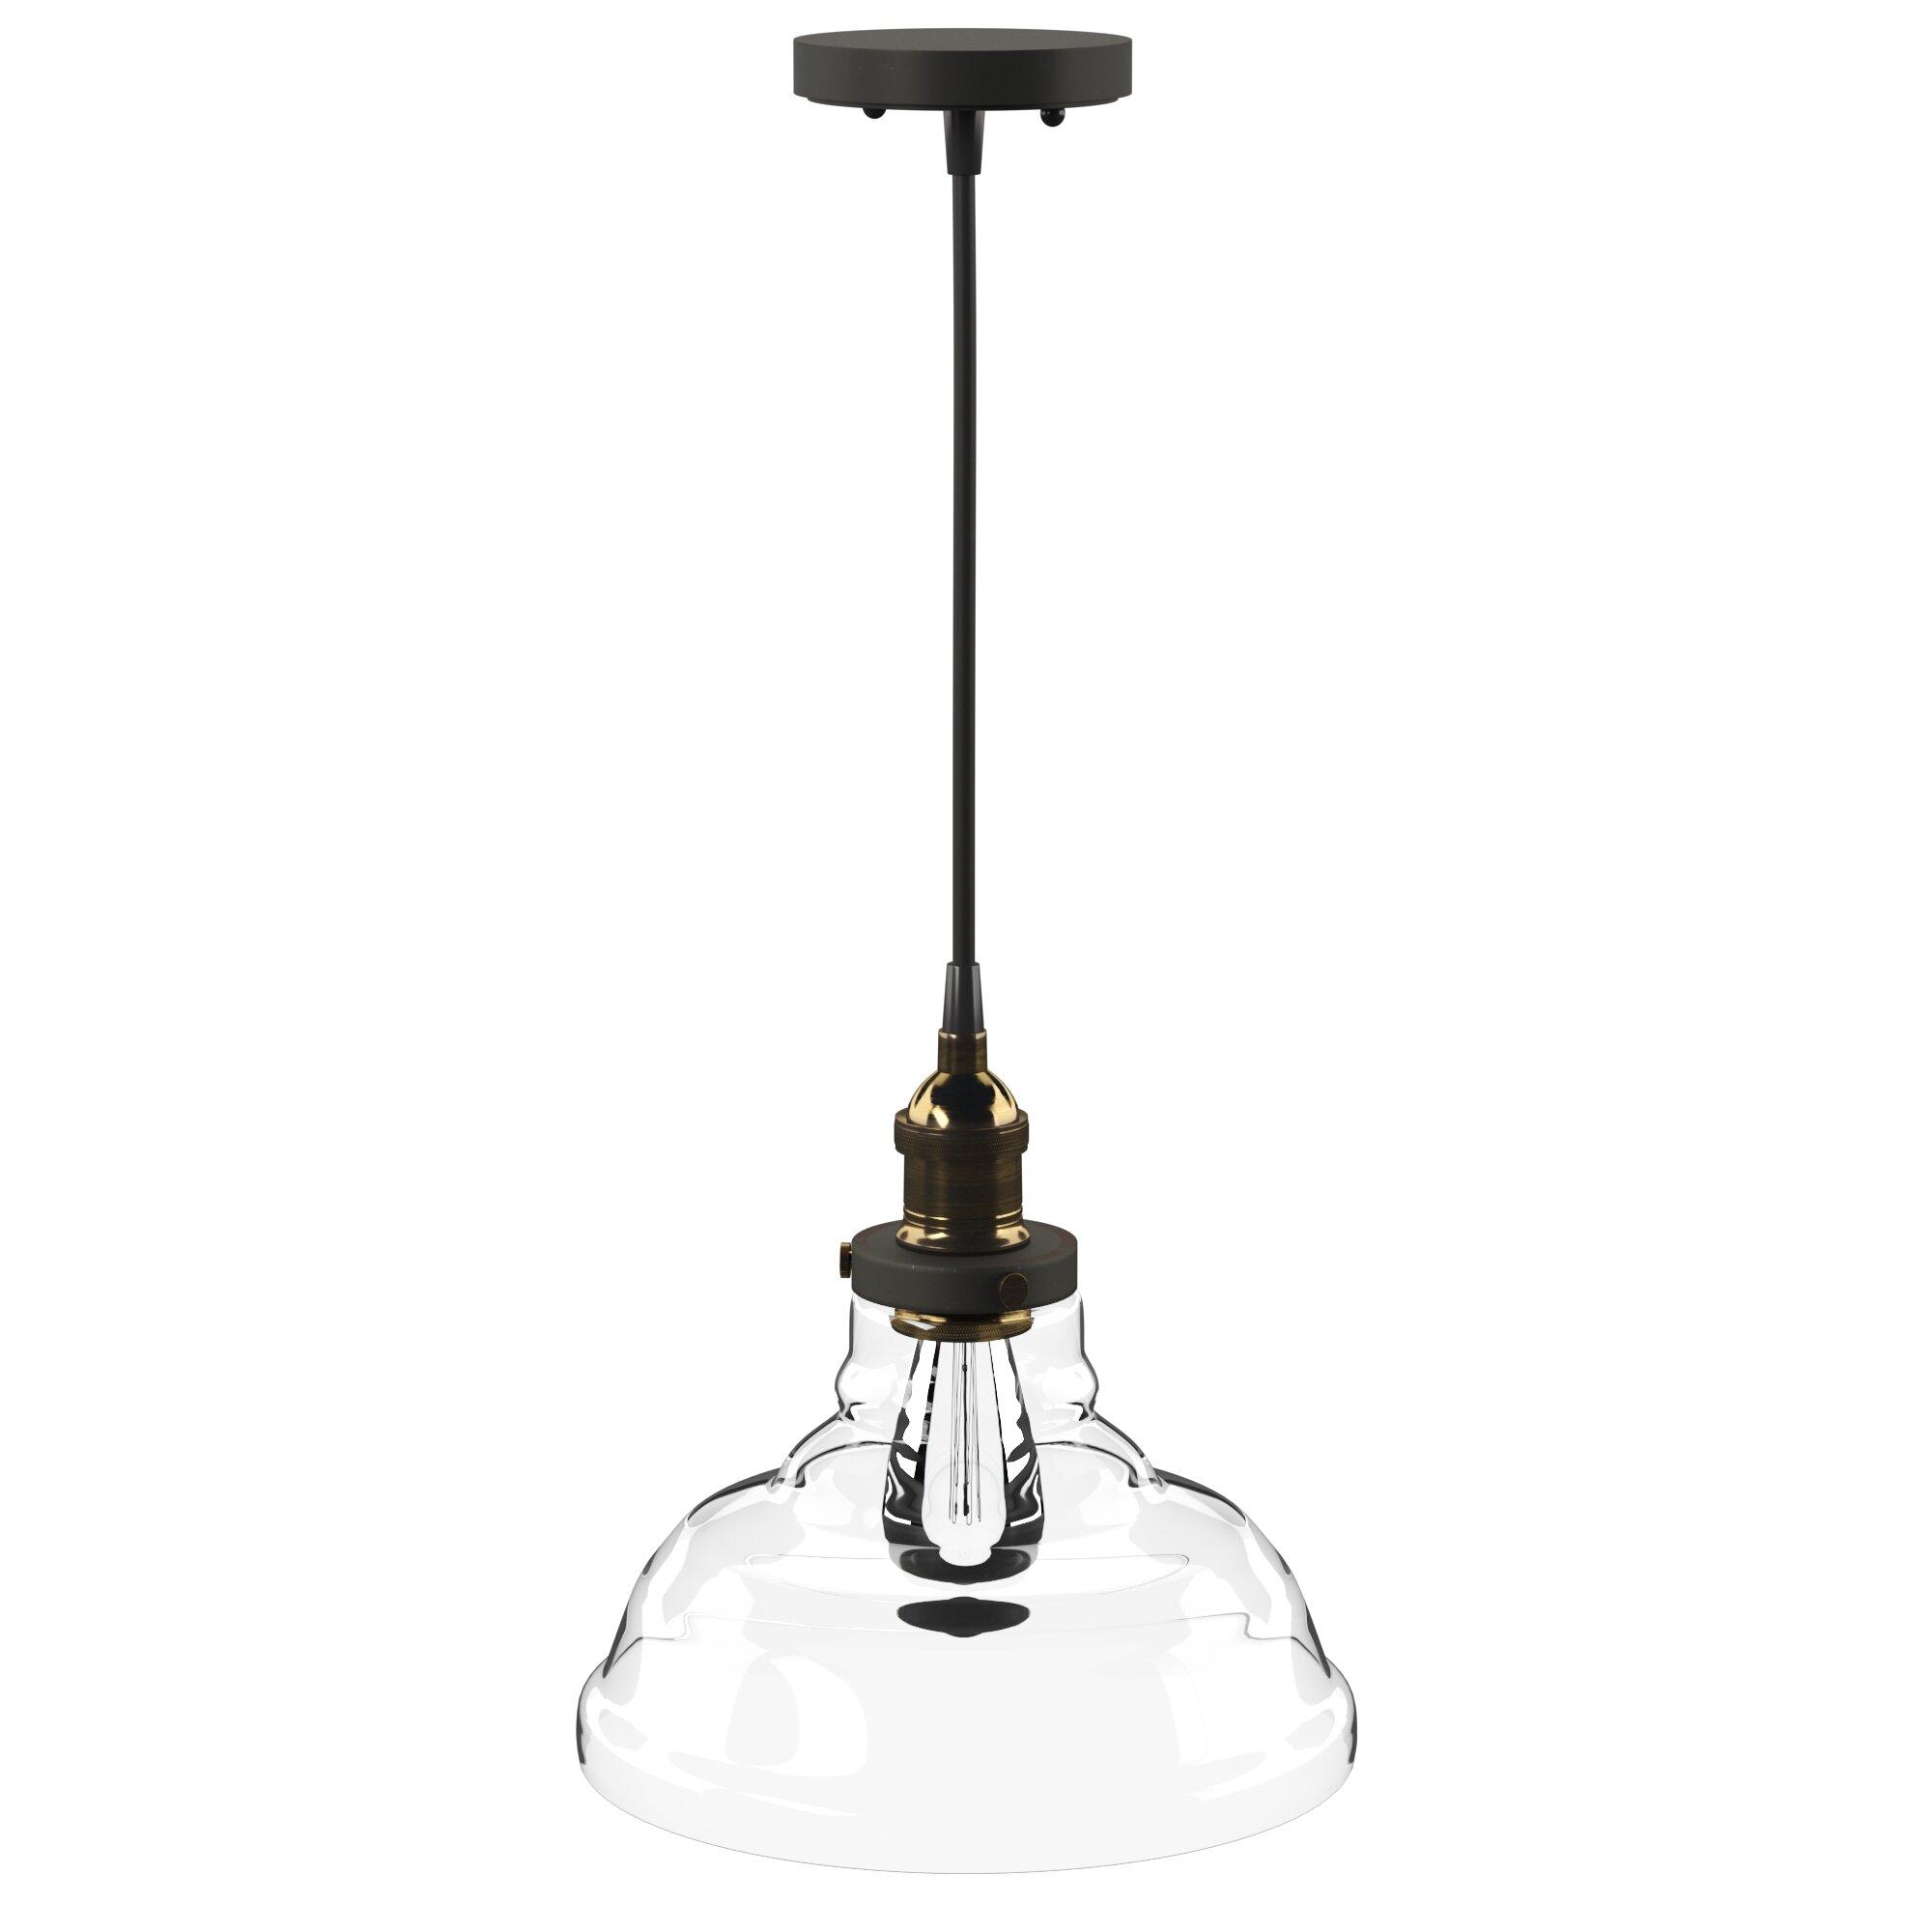 Akakios 1 Light Single Bell Pendant With Regard To Conard 1 Light Single Teardrop Pendants (View 20 of 30)